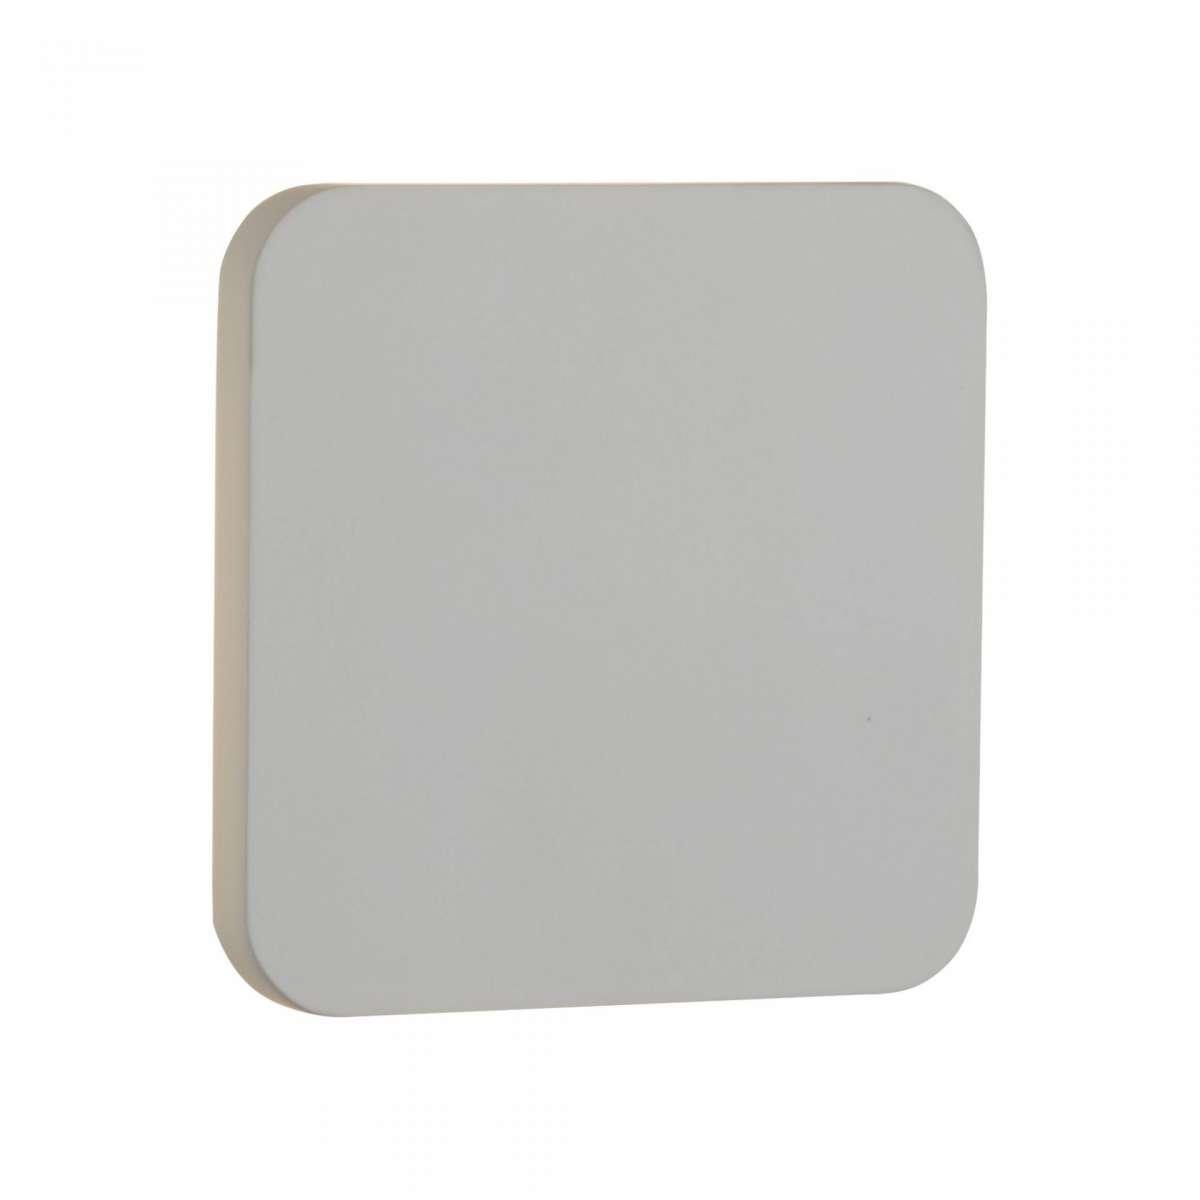 Gypsum 4W Led White Plaster Wall Light